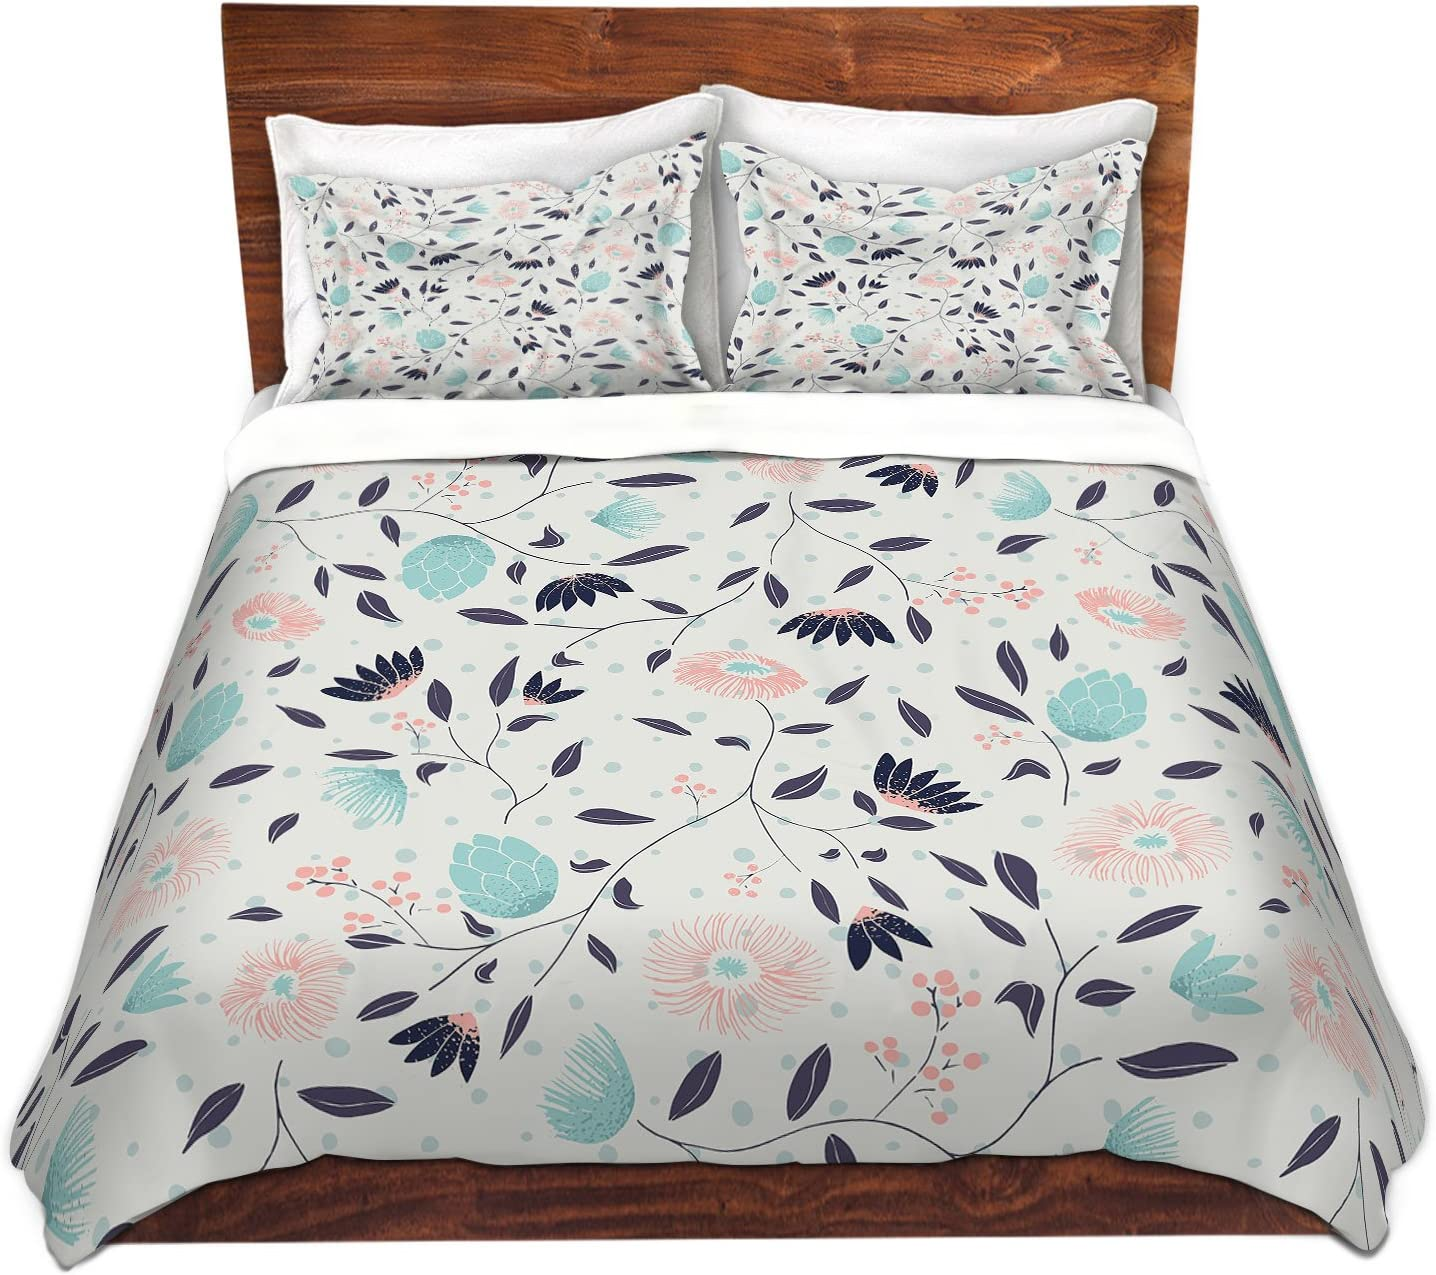 Amazon Com Dia Noche Designs Microfiber Duvet Covers Metka Hiti Midnight Bloom Blue Pink Home Kitchen